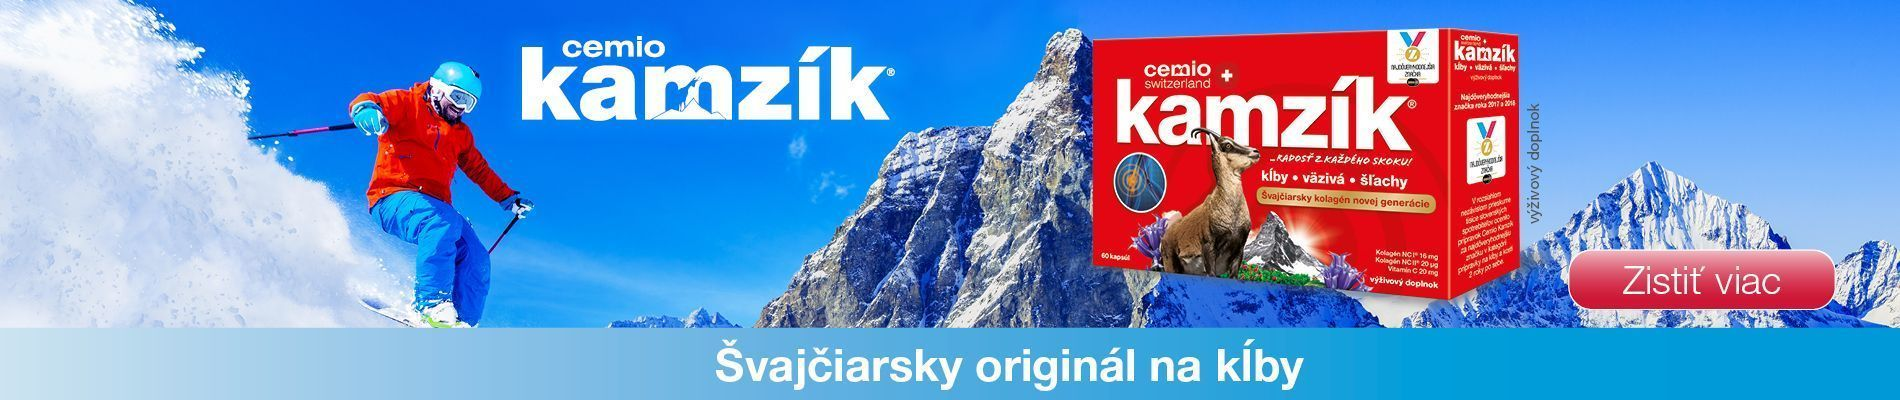 Cemio Kamzík banner - gsklub.sk